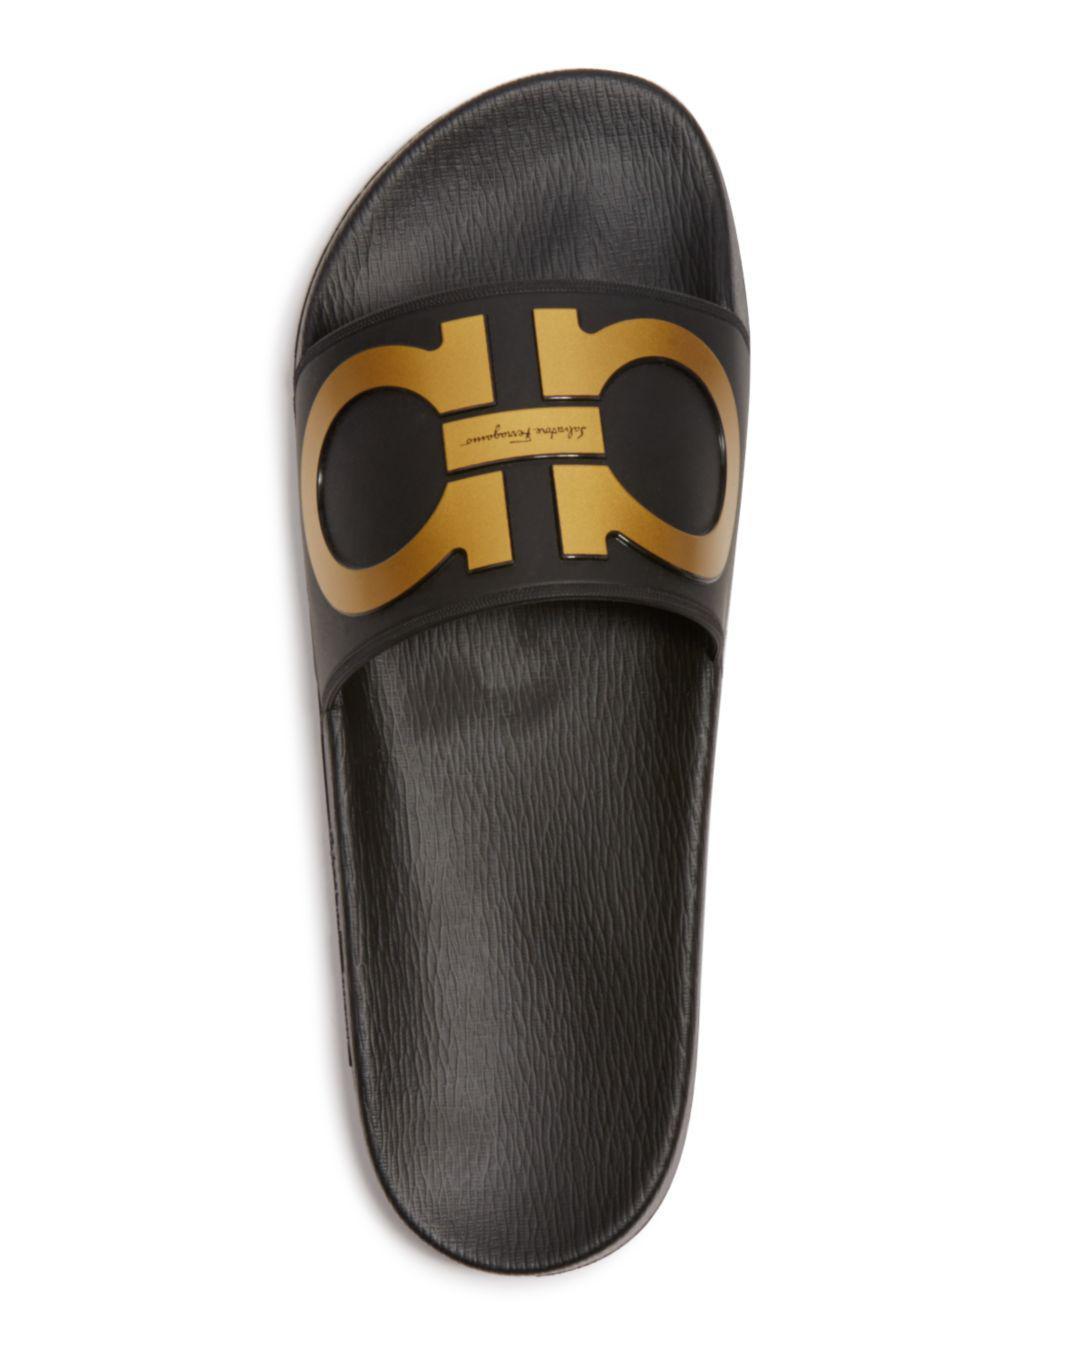 1b9a47298bf1 Lyst - Ferragamo Groove Gancini Slide Sandal in Black for Men - Save  56.41025641025641%